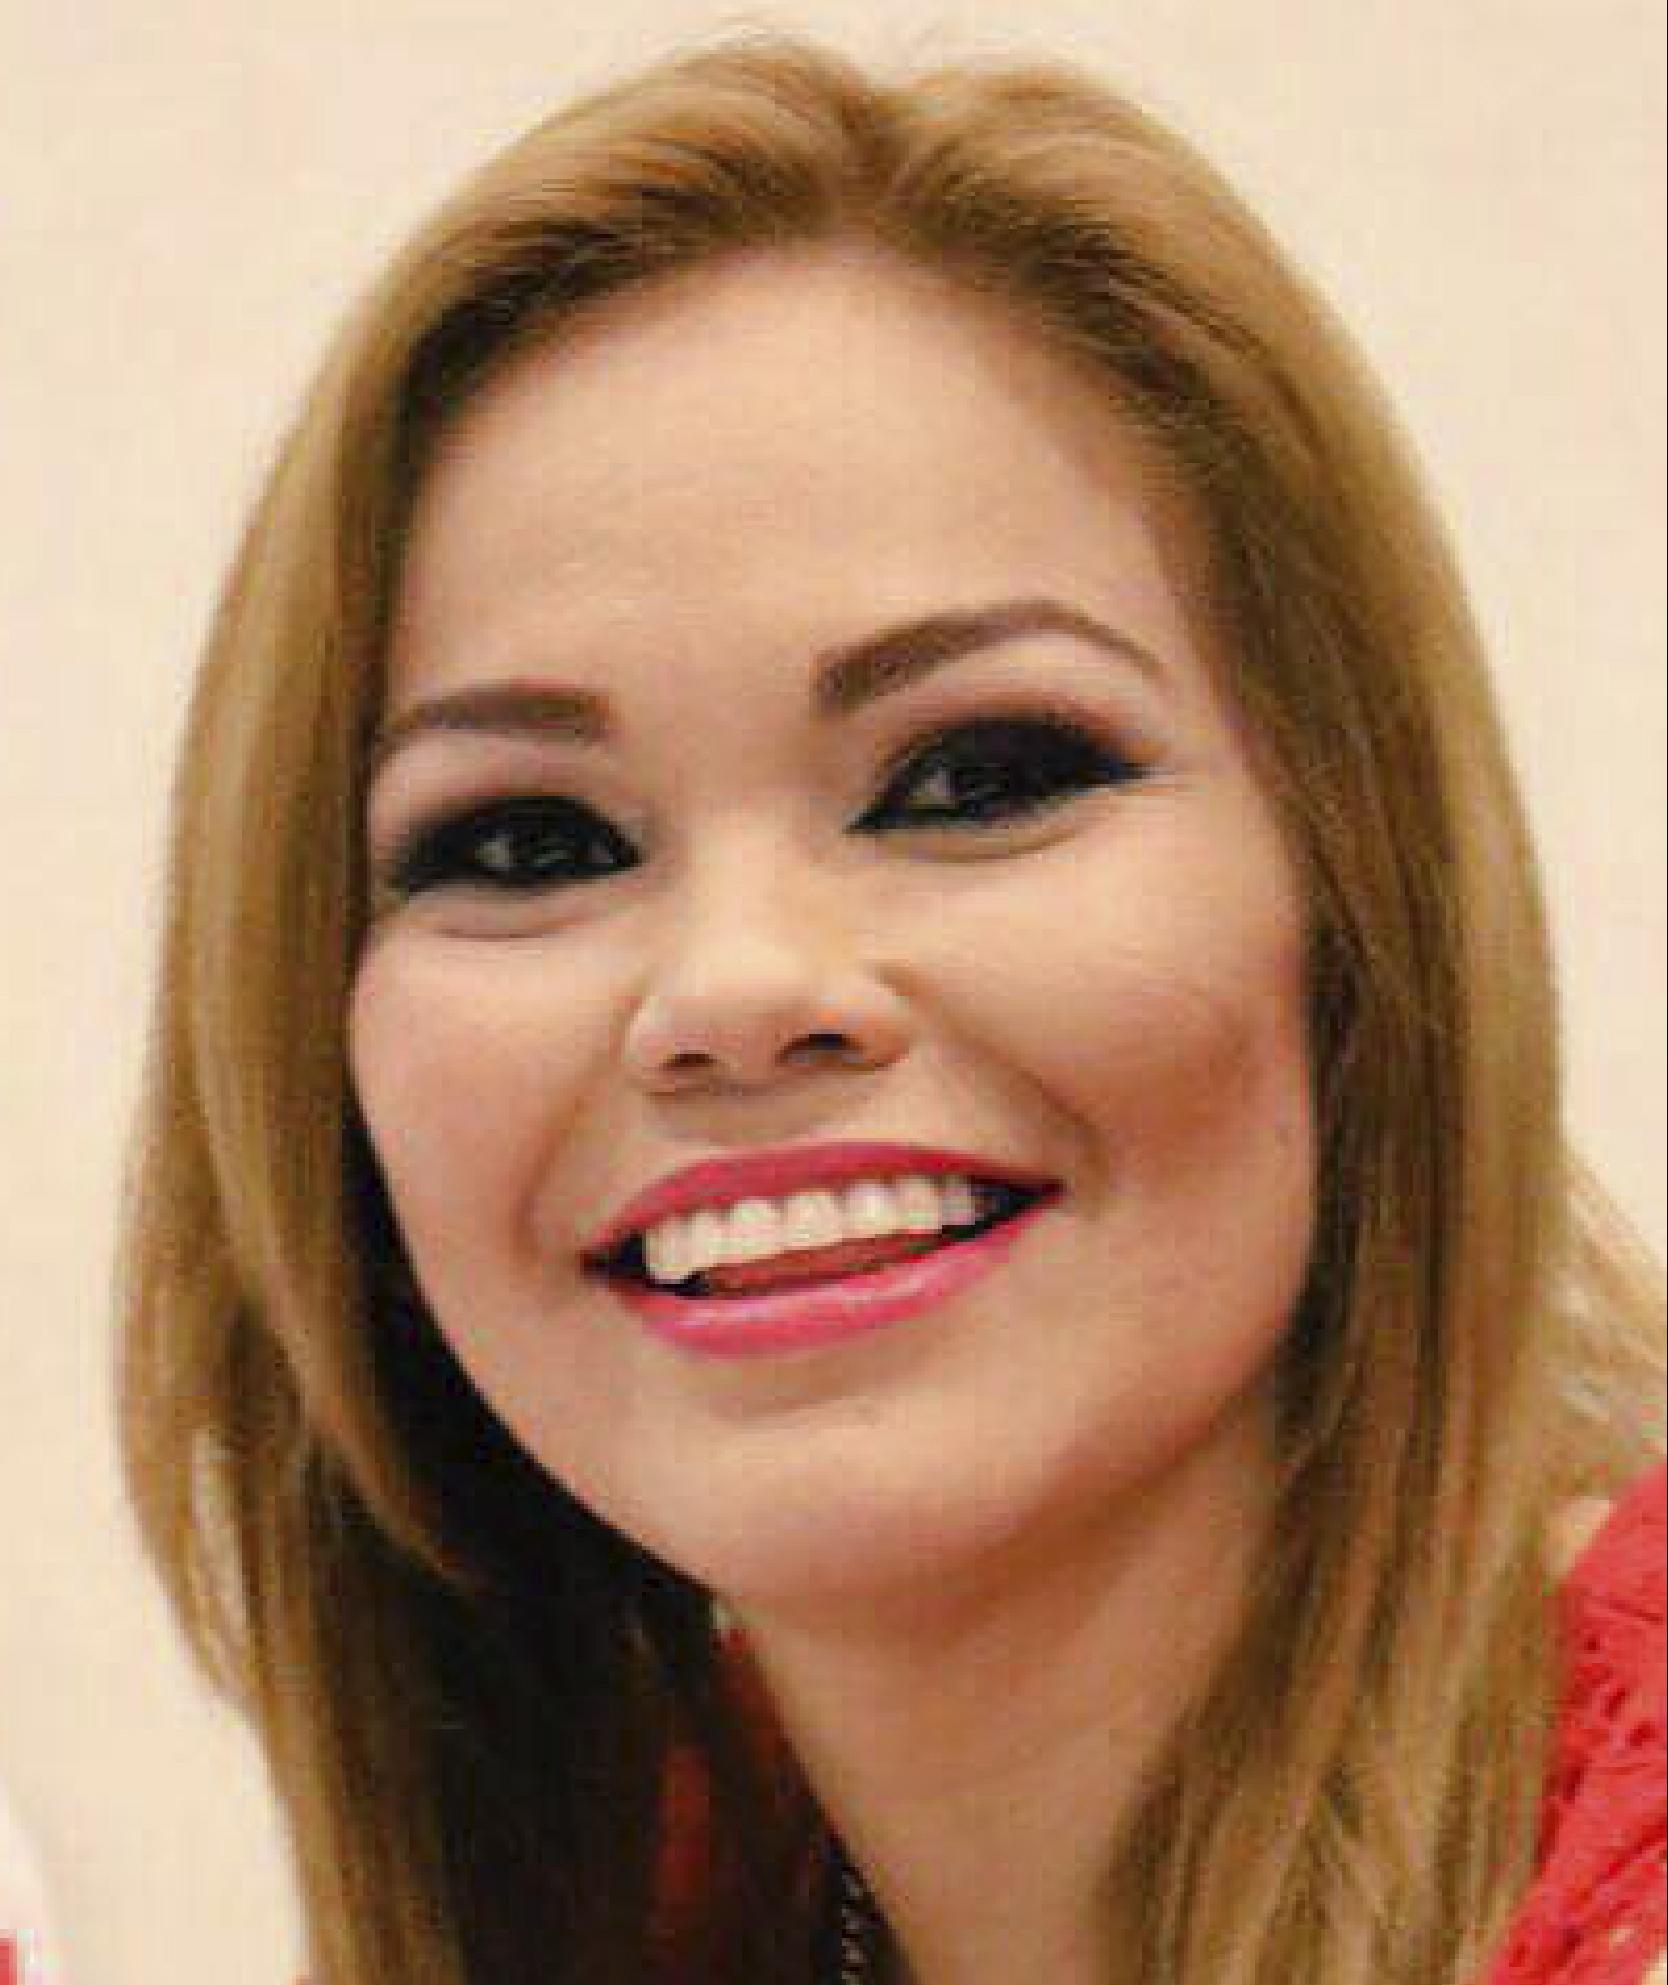 Paola Iveth Garate Valenzuela